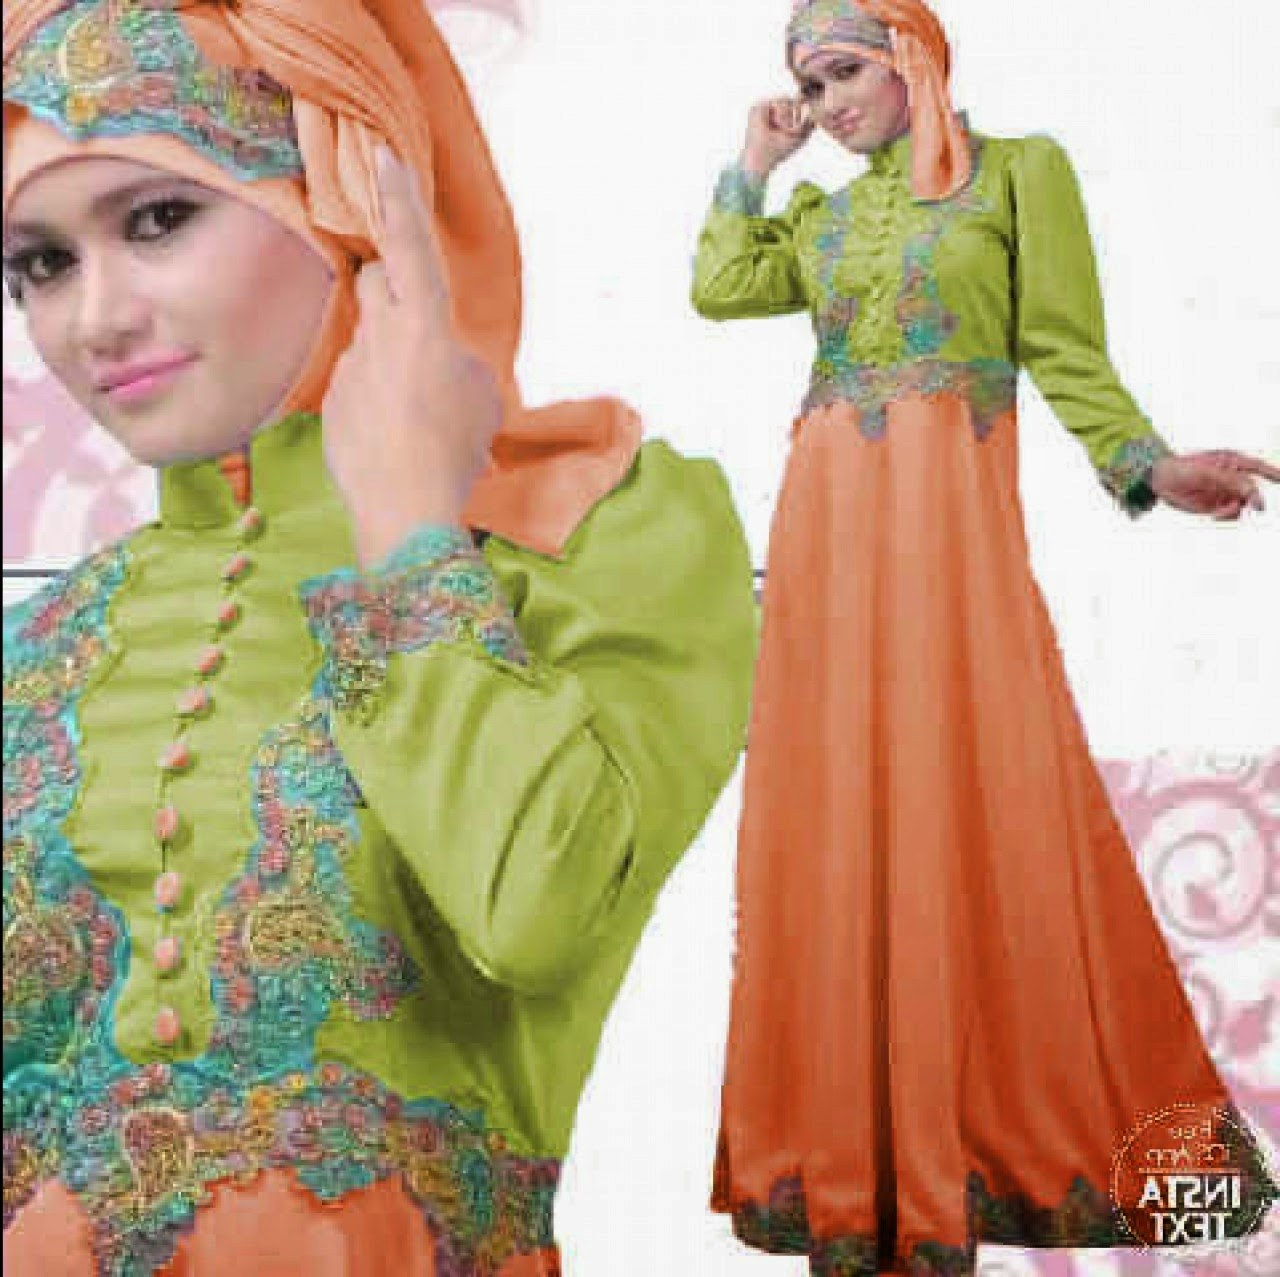 Model Model Baju Lebaran Dewasa 2018 Budm Kumpulan Foto Model Baju Kebaya Lebaran Terbaru 2018